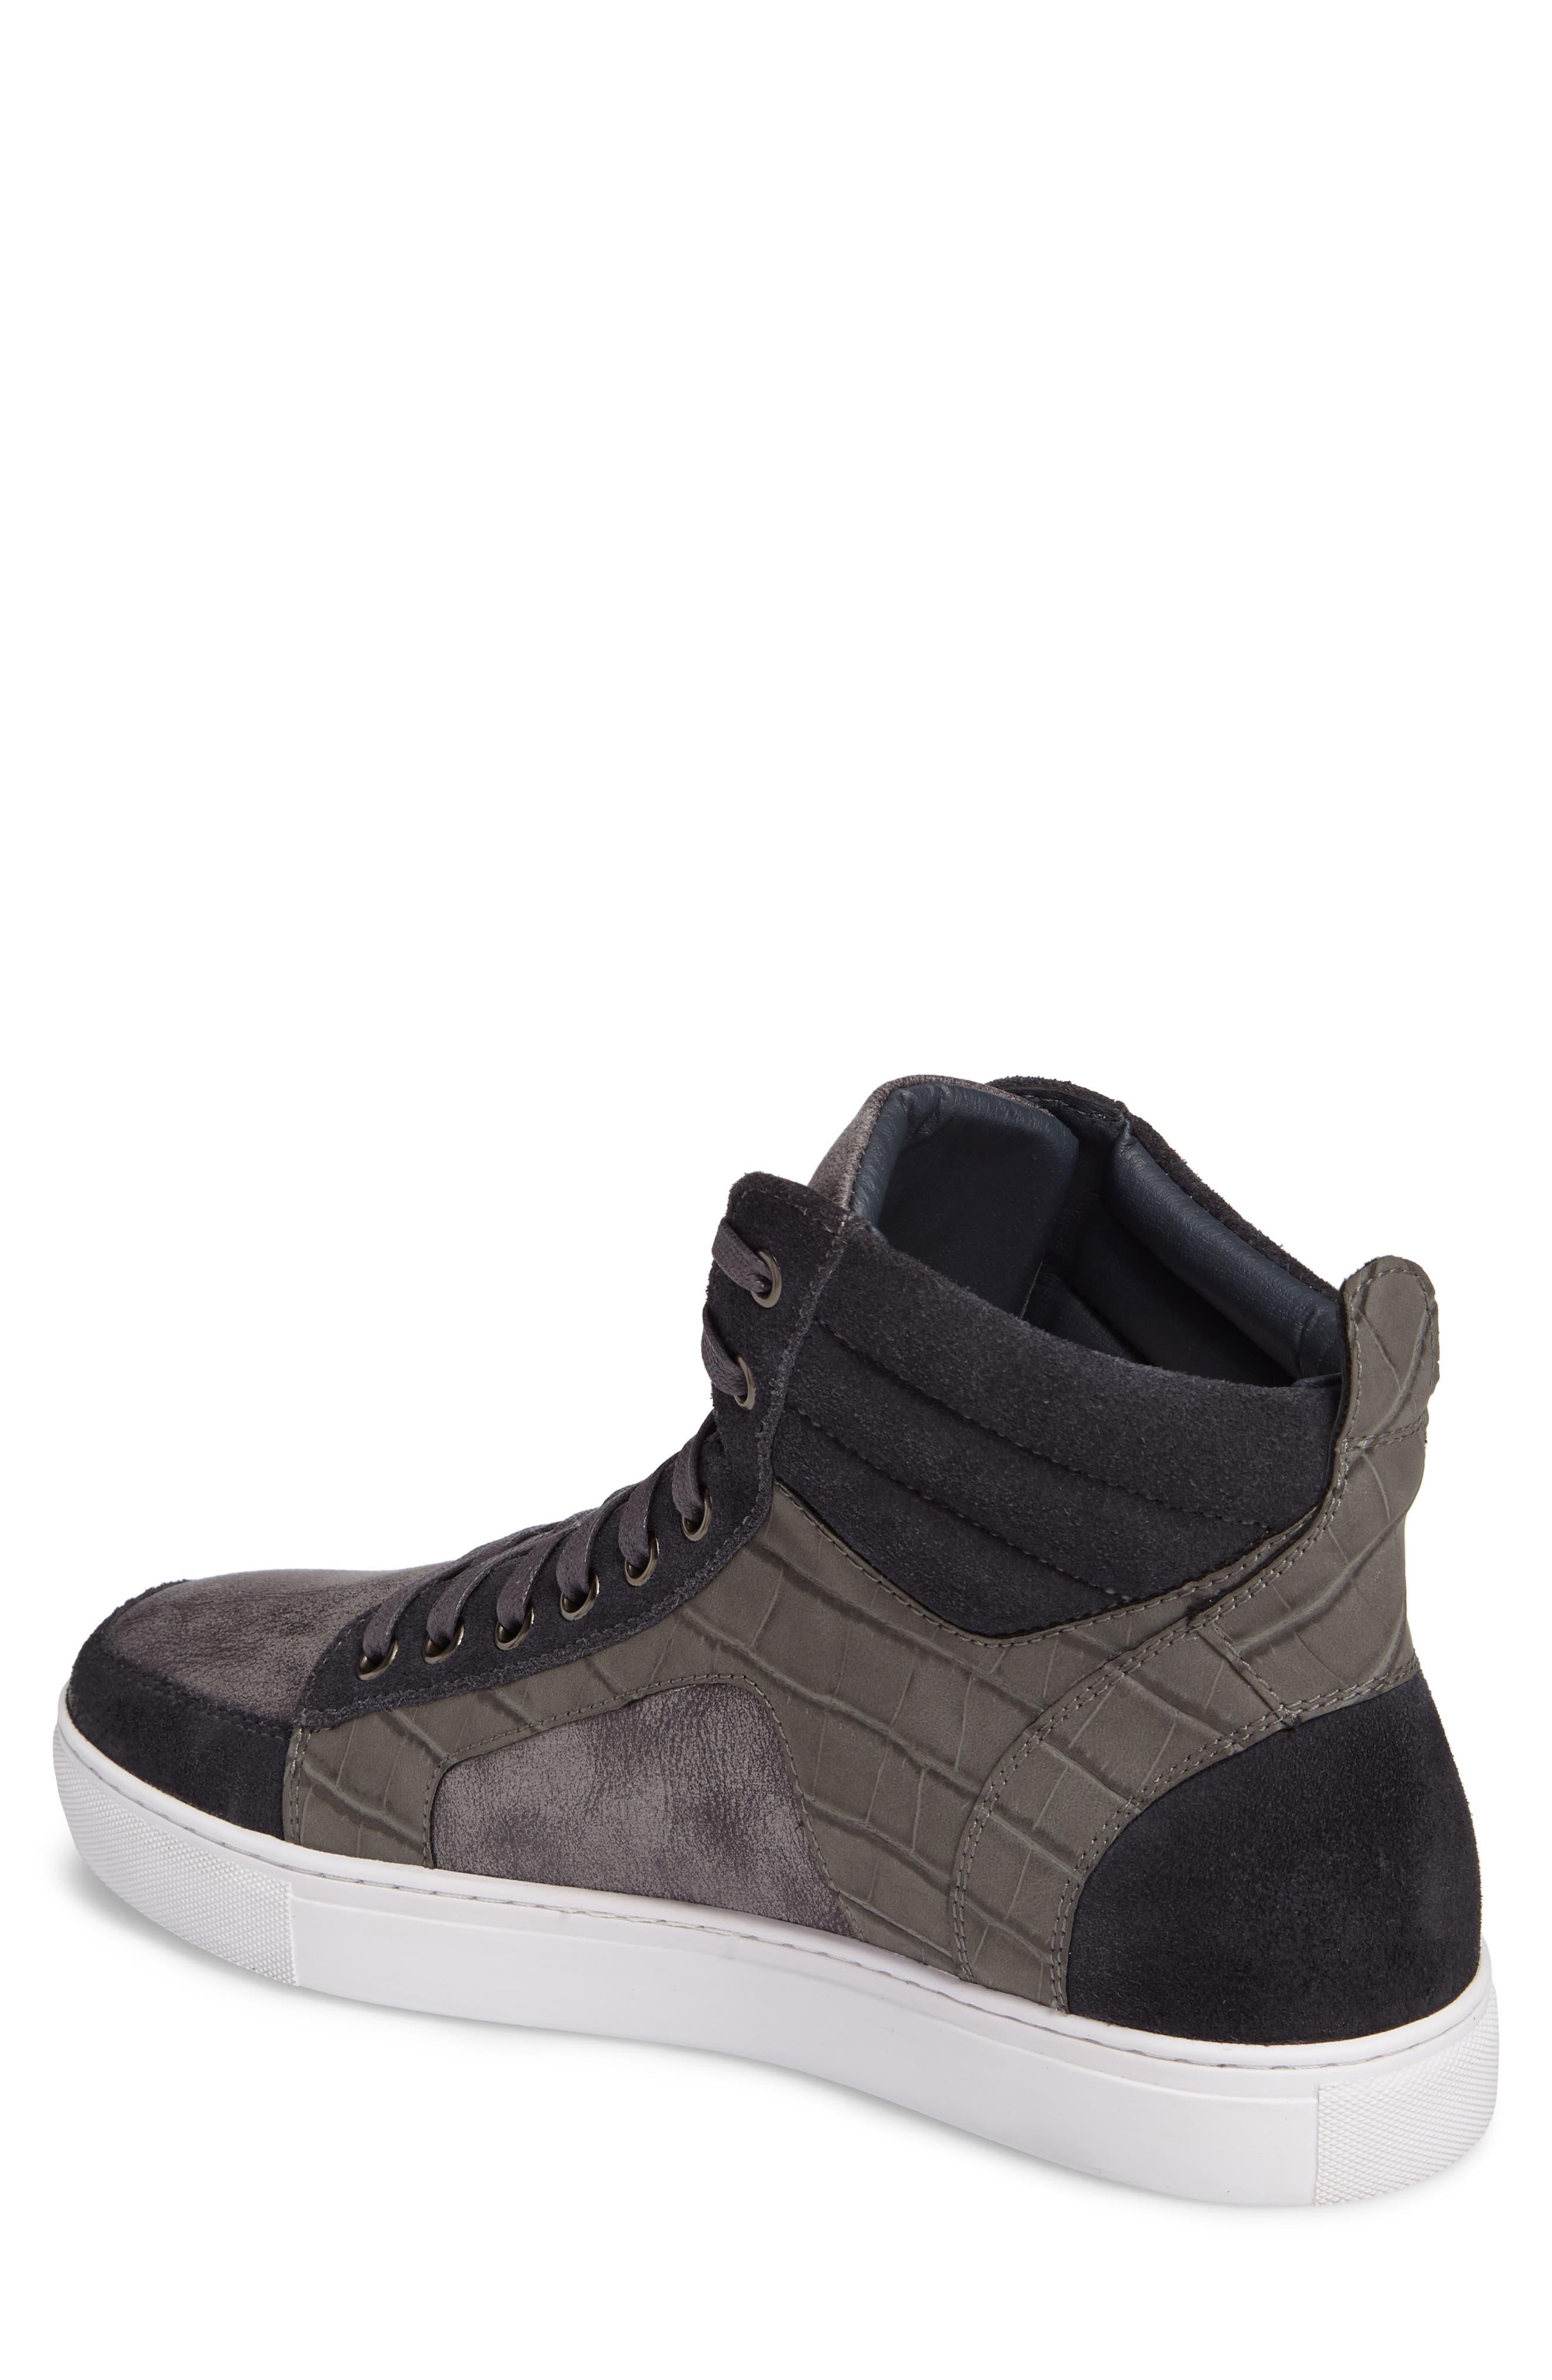 Makin Sneaker,                             Alternate thumbnail 2, color,                             021